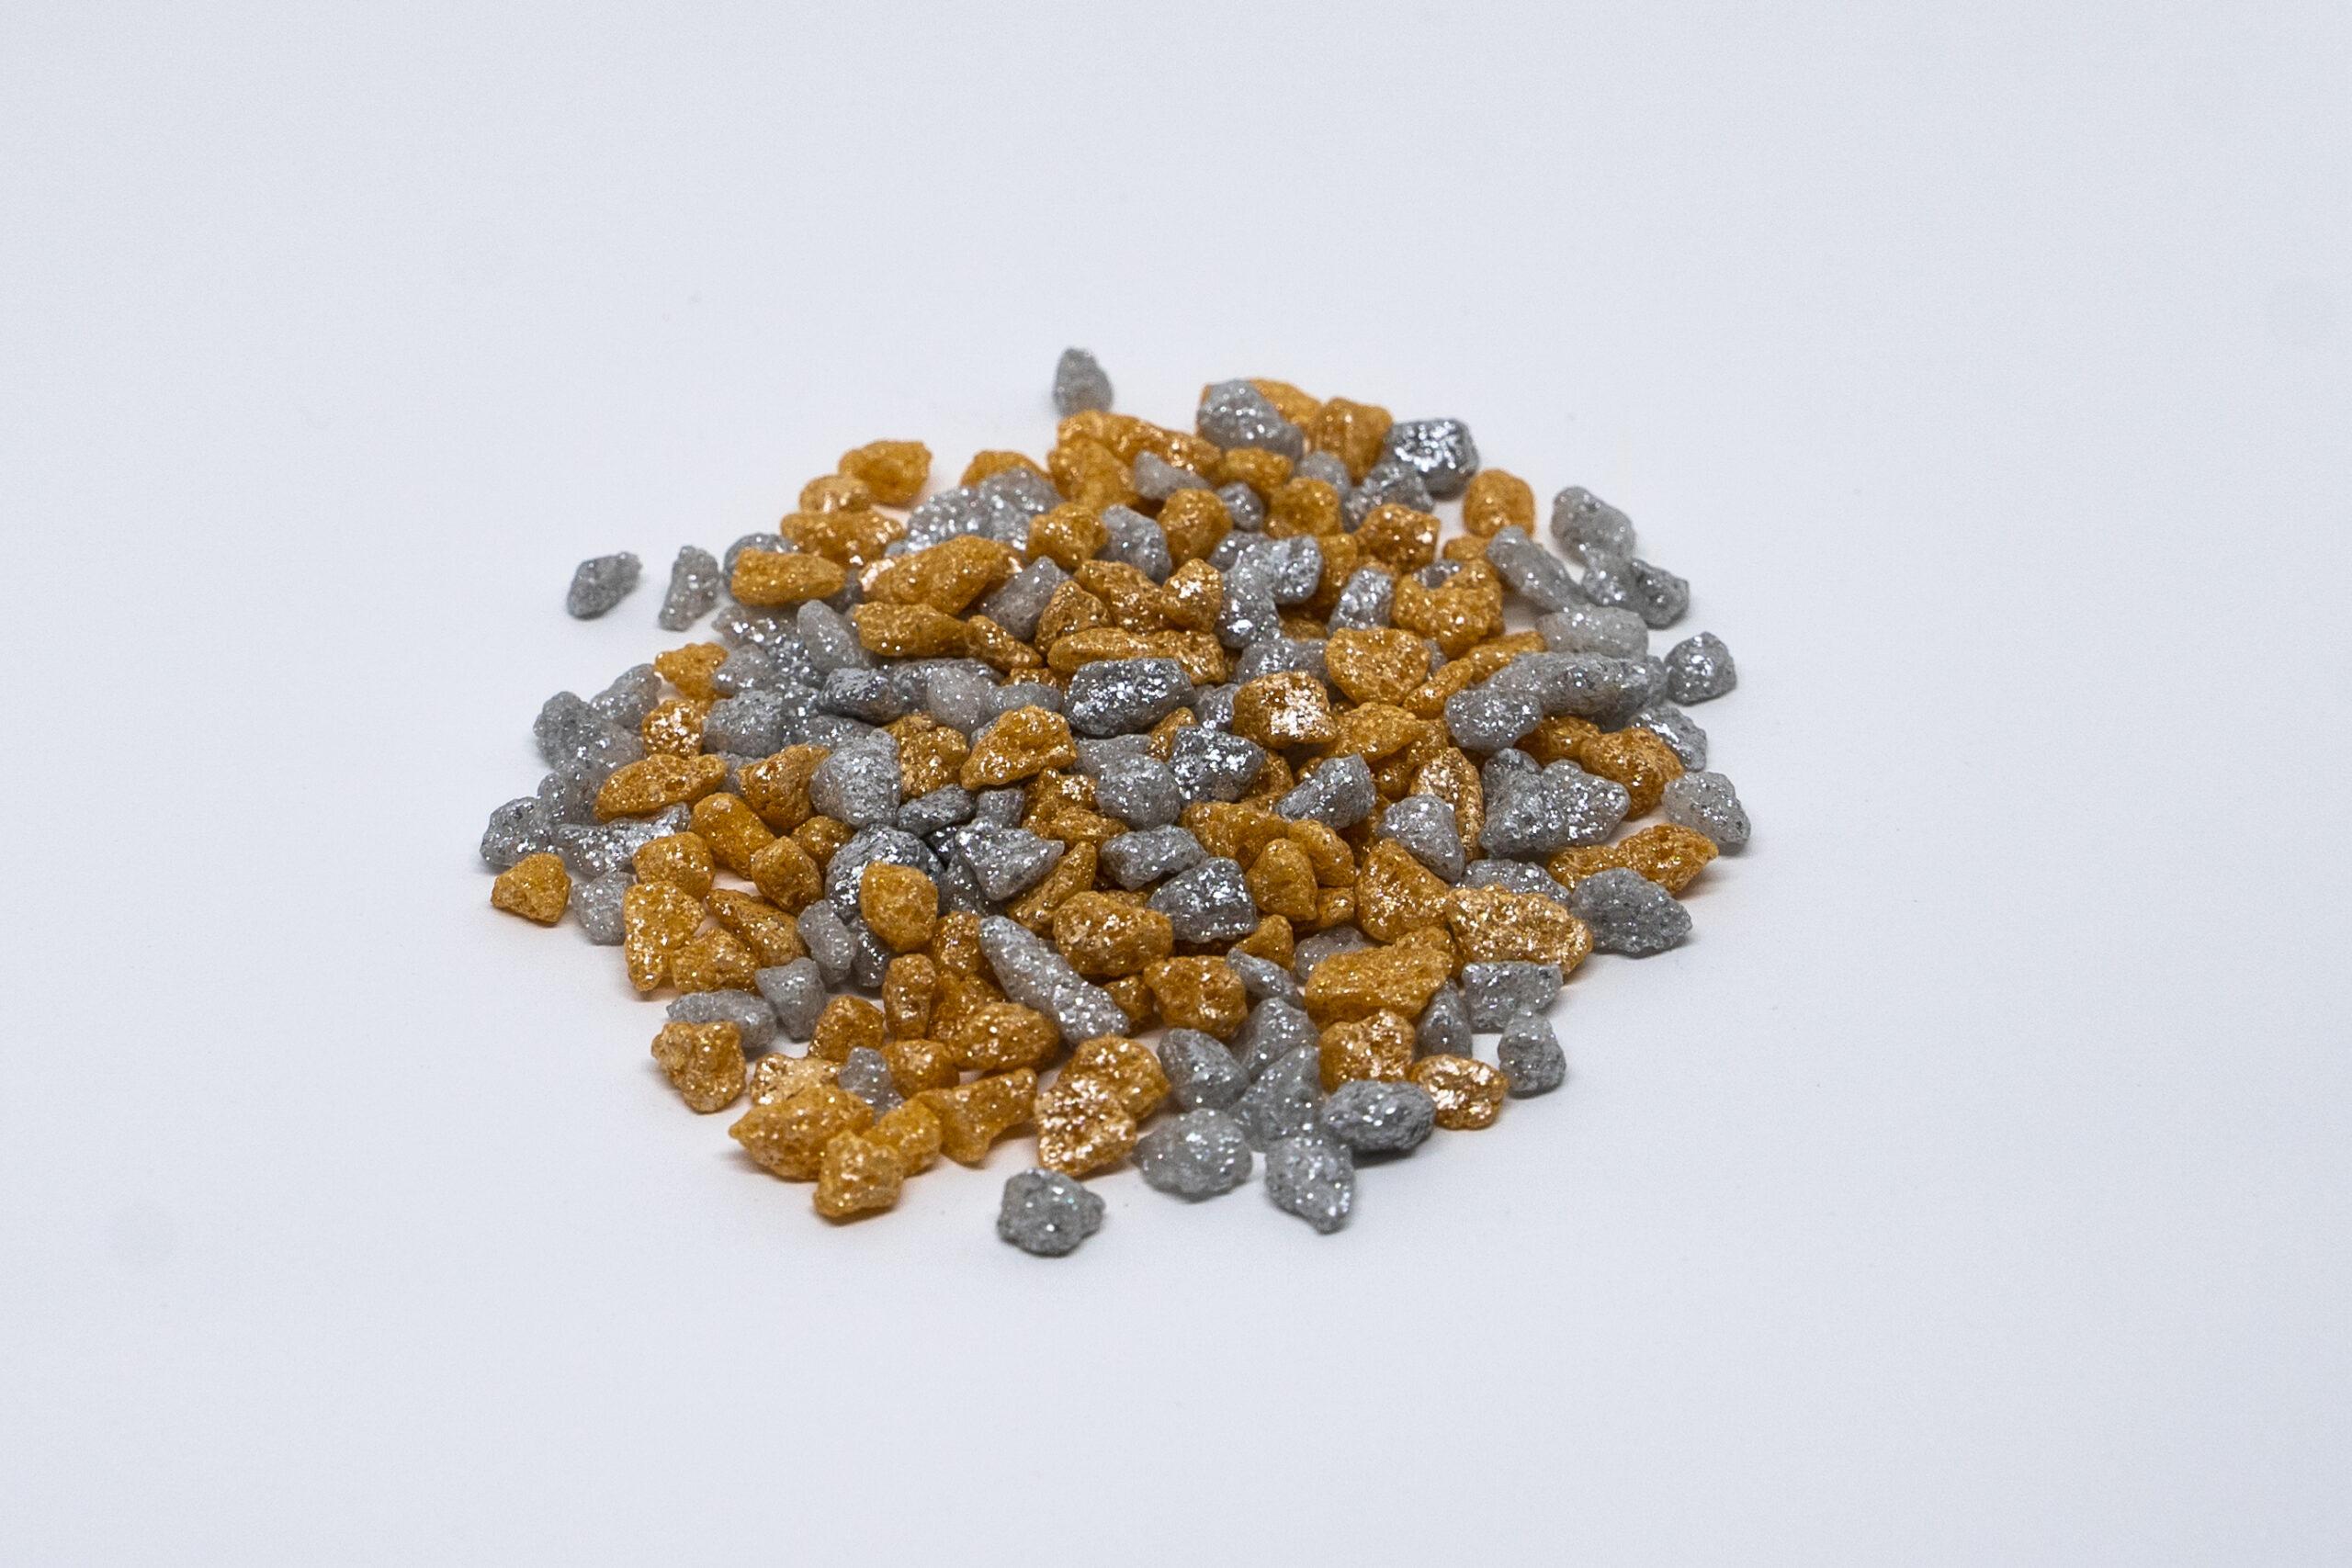 Gold and silver Pearl sugar